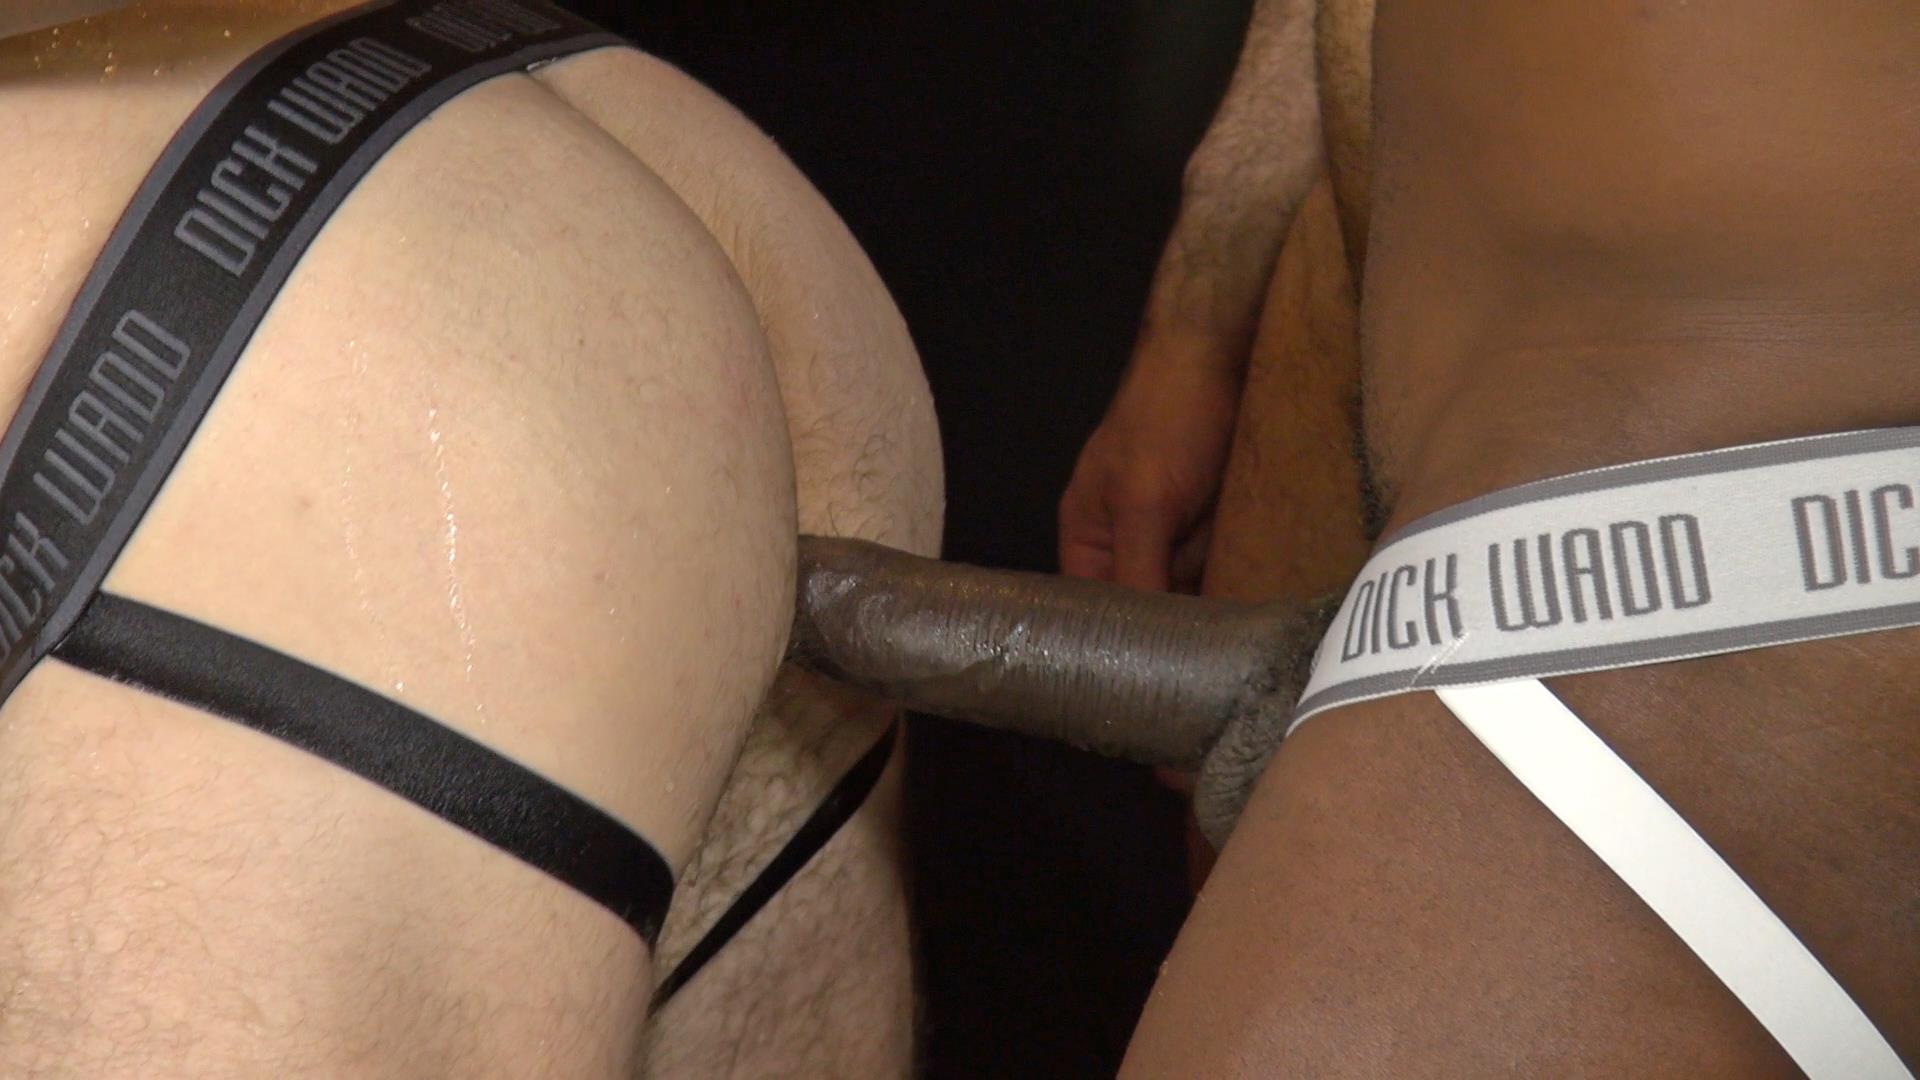 Raw and Rough Ken Byker Dayton O'Connor Trelino Shay Michaels Adam Russo Cutler X Interracial Bareback Orgy Amateur Gay Porn 04